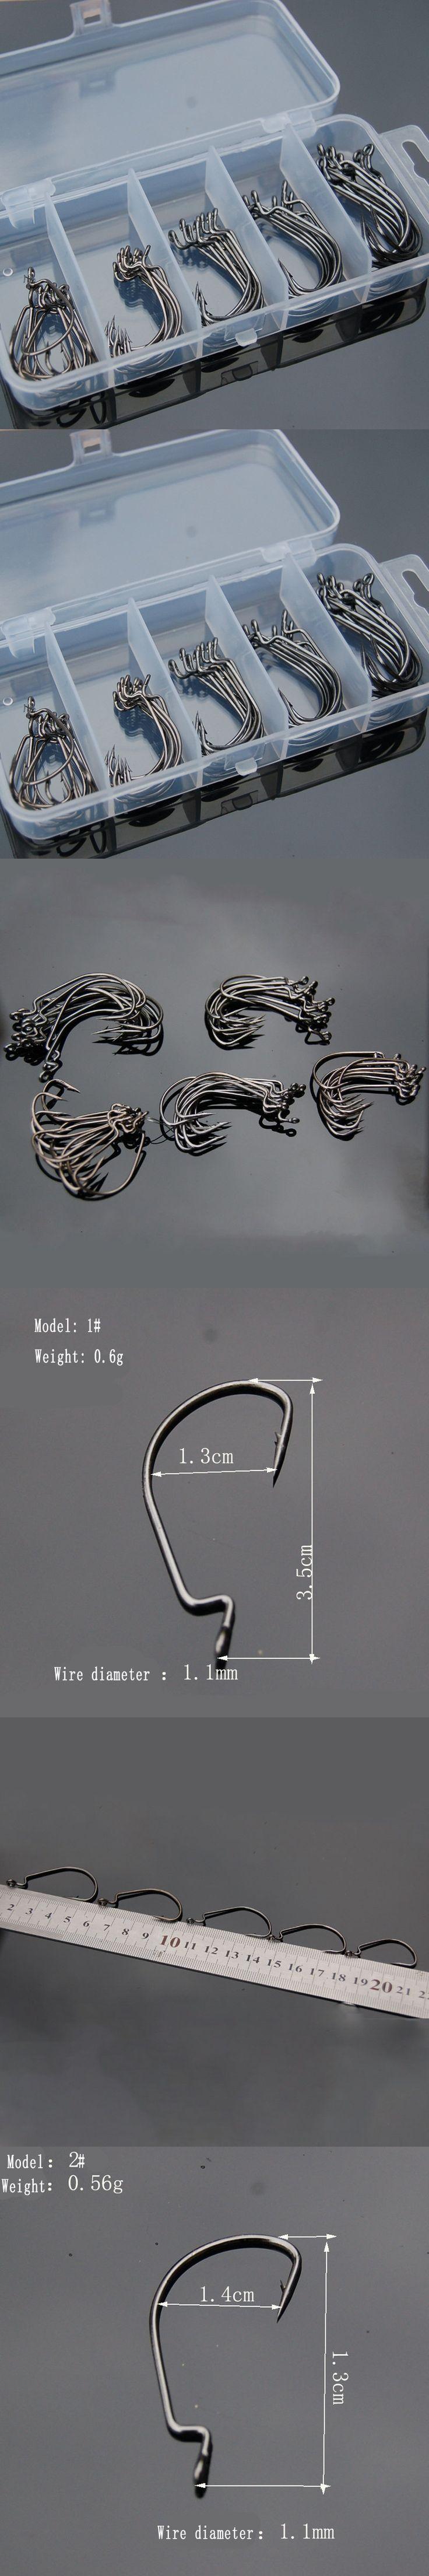 High Carbon steel fishing hook 50 Pcs 1#2# 1/0# 2/0# 3/0# hook fishing hooks anzol para pesca Soft bait haken barbe gancho anzol